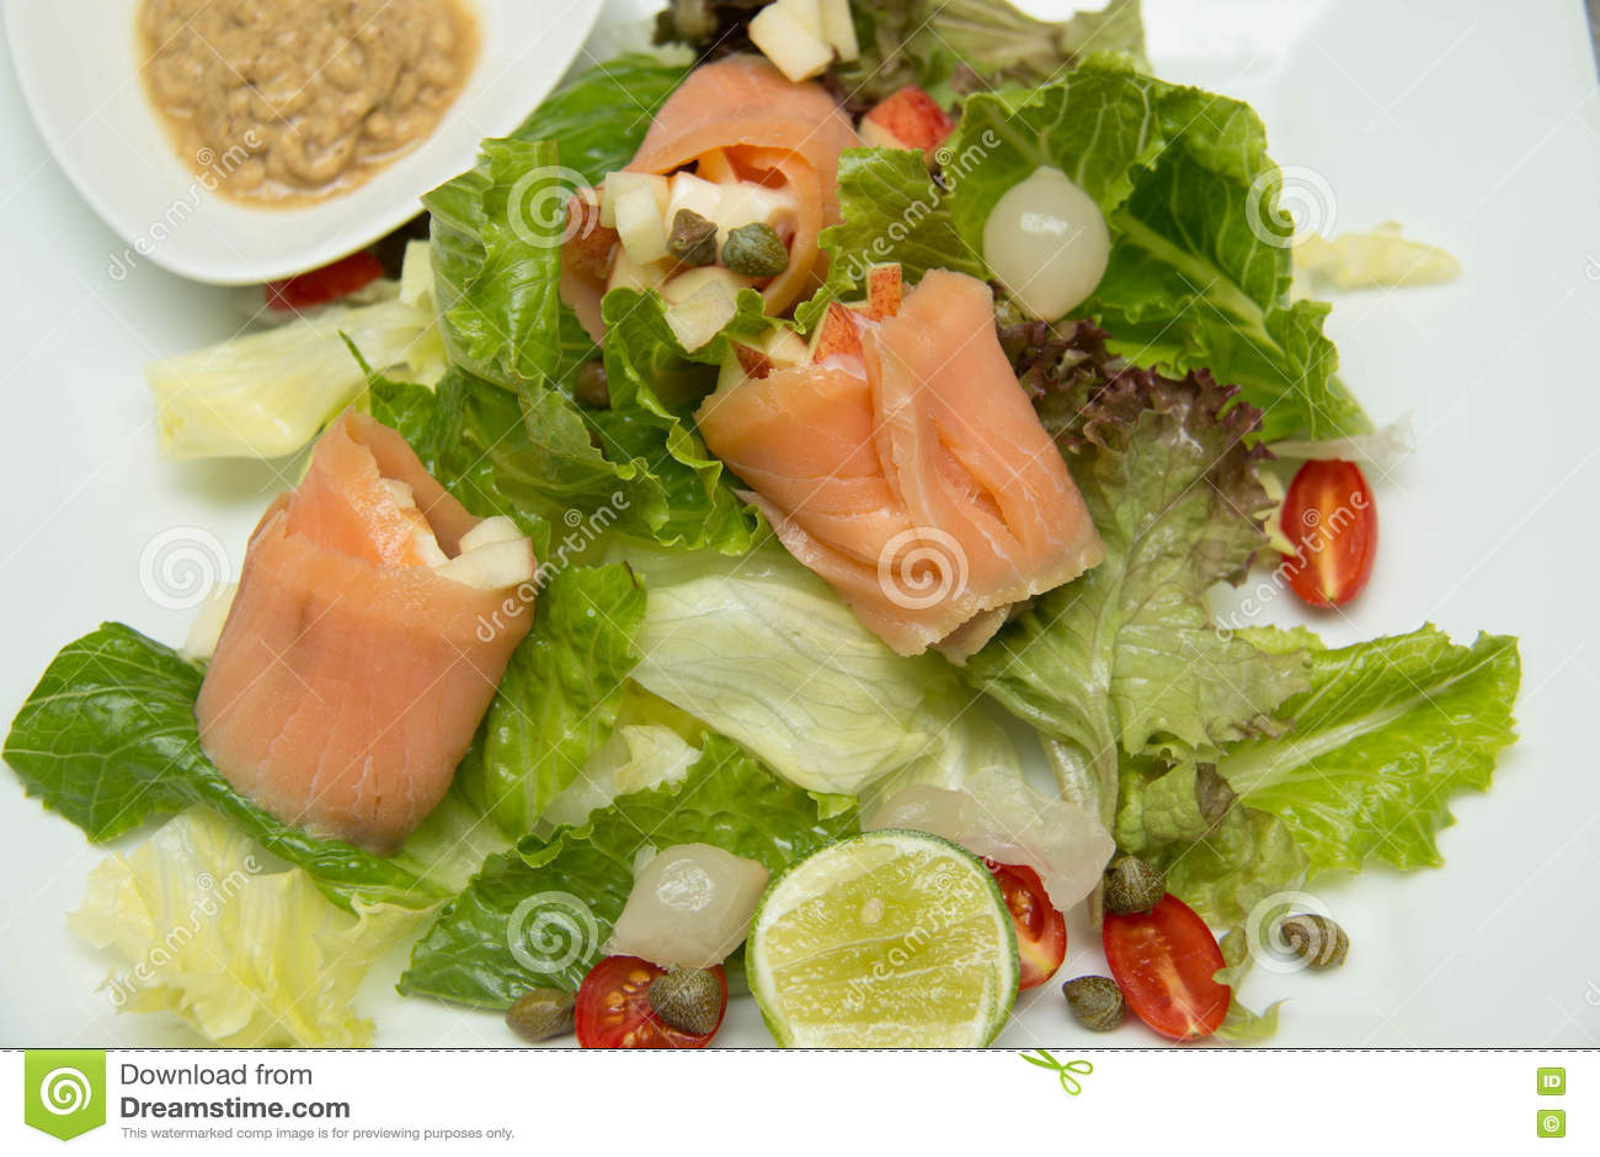 Salade gerookte zalm met groenten